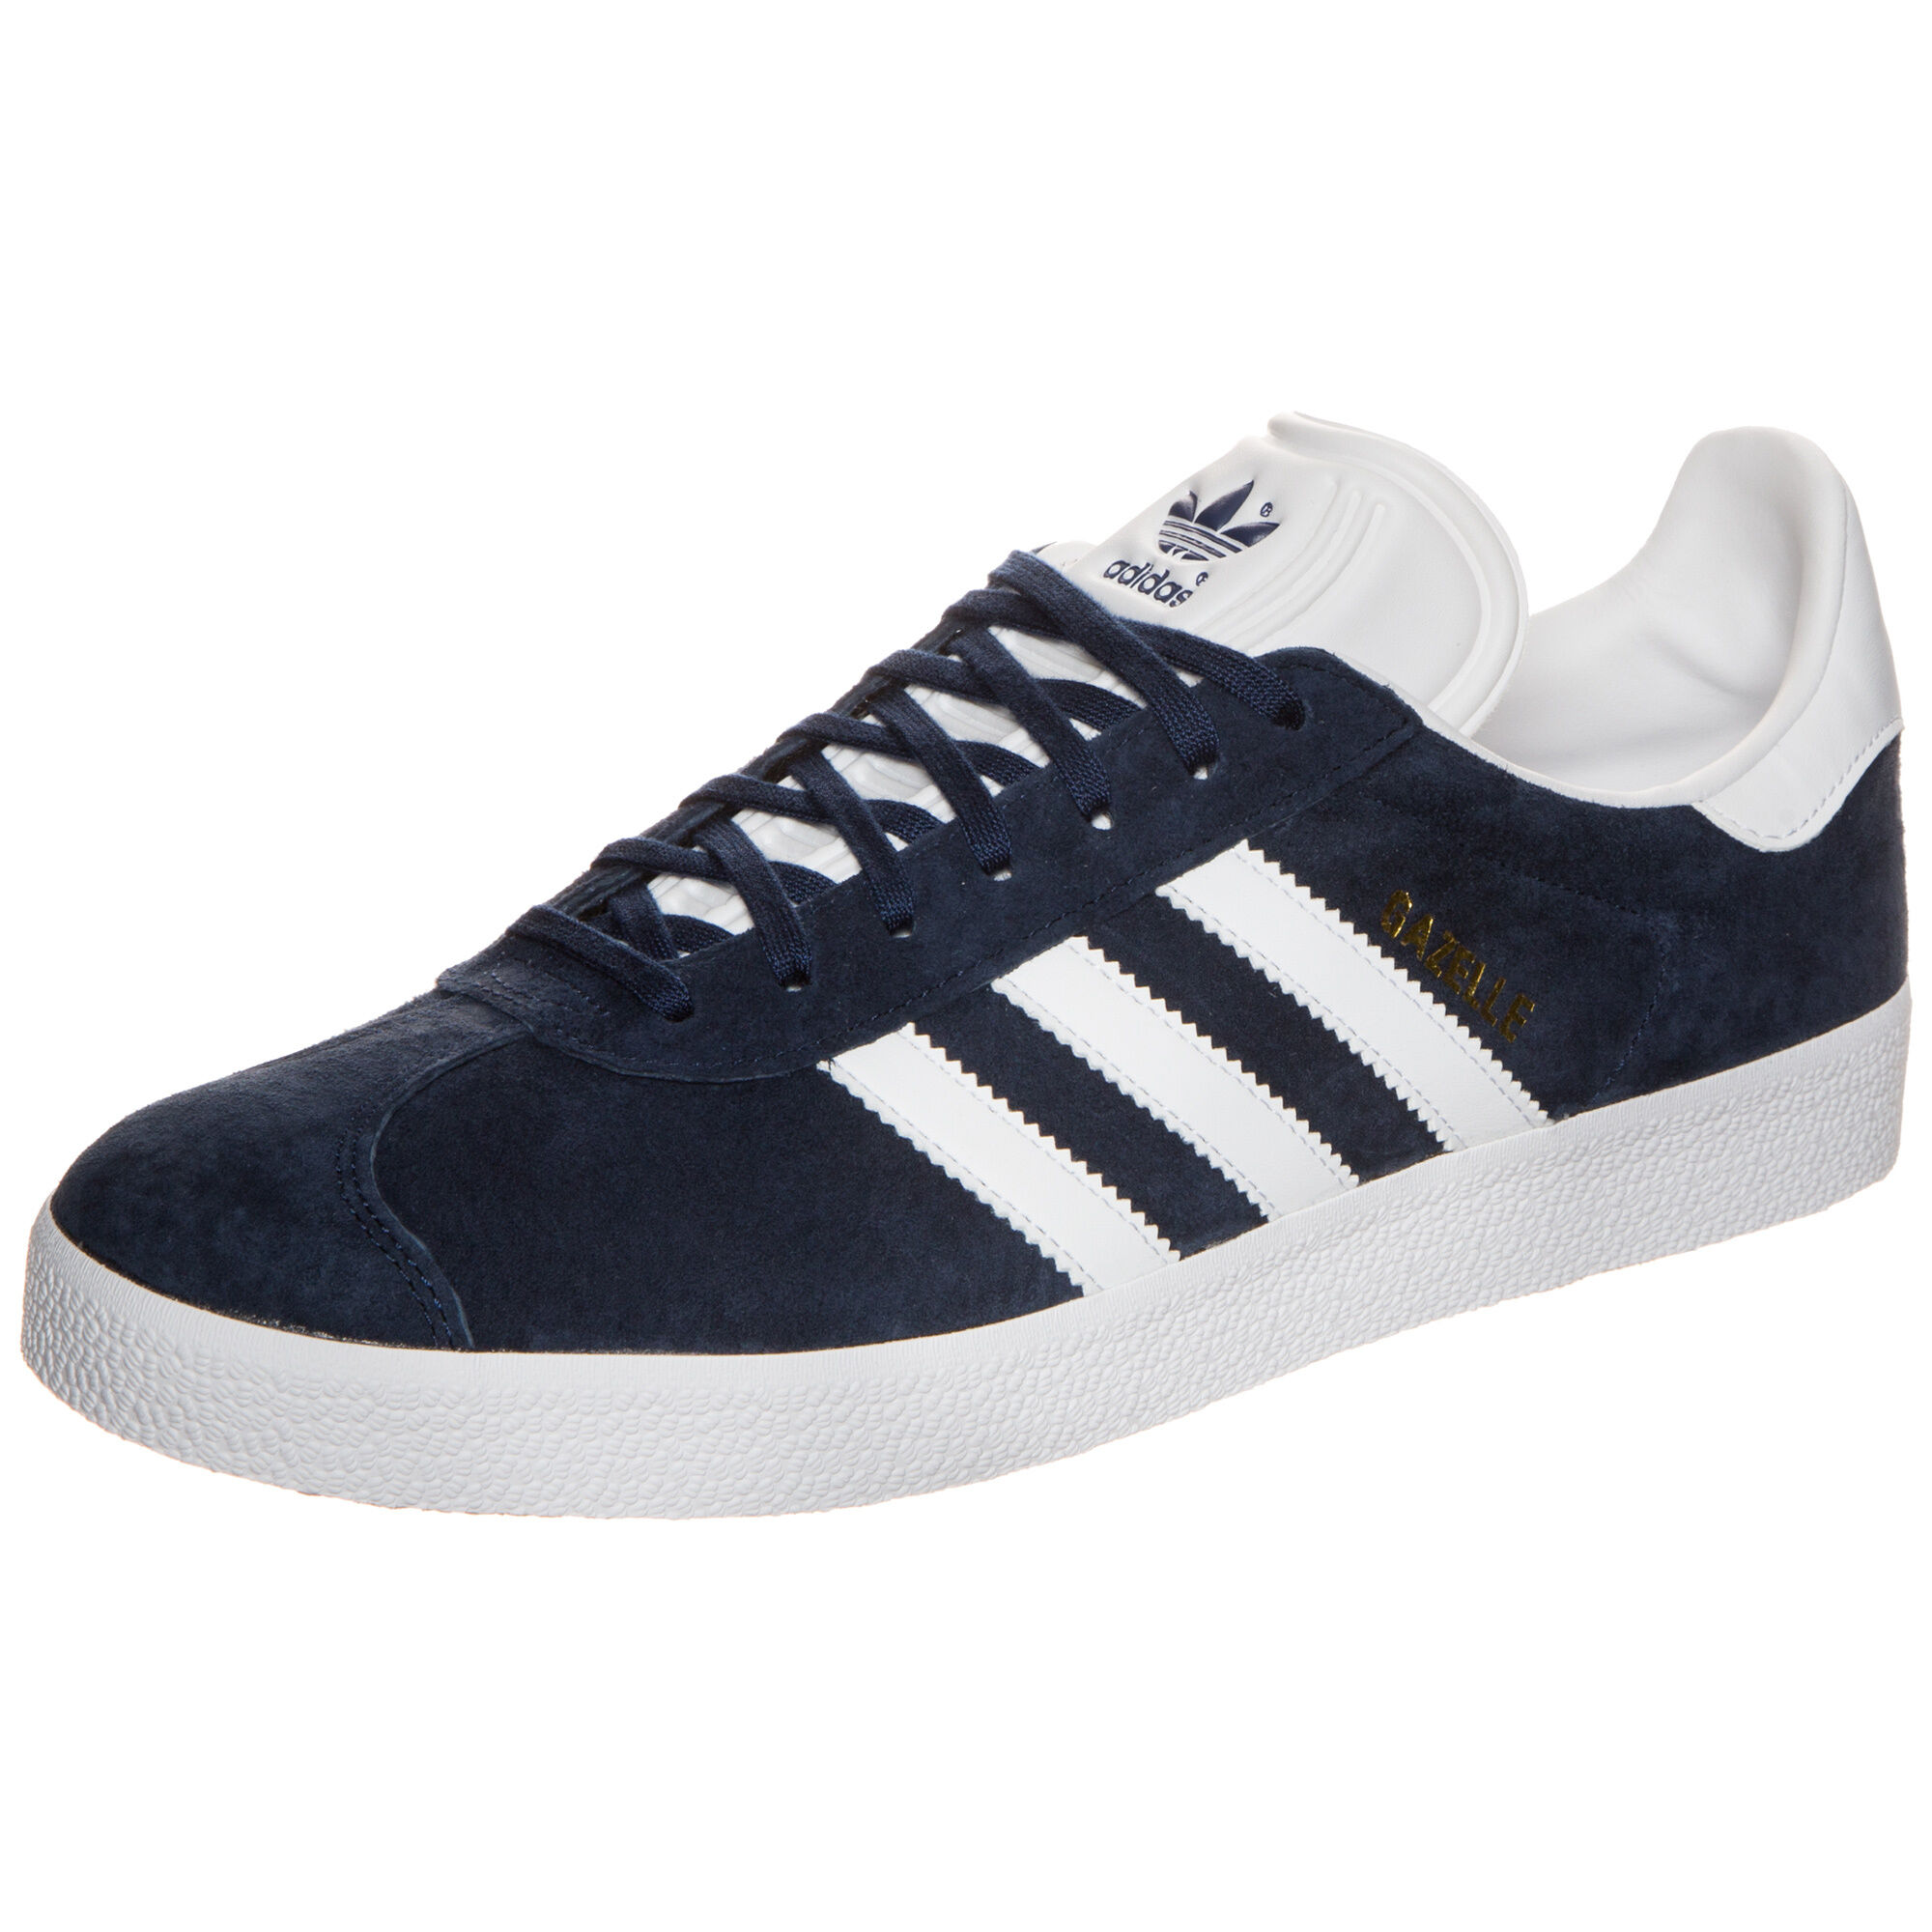 adidas Gazelle Herren | Sneaker Shop Lifestyle bei OUTFITTER